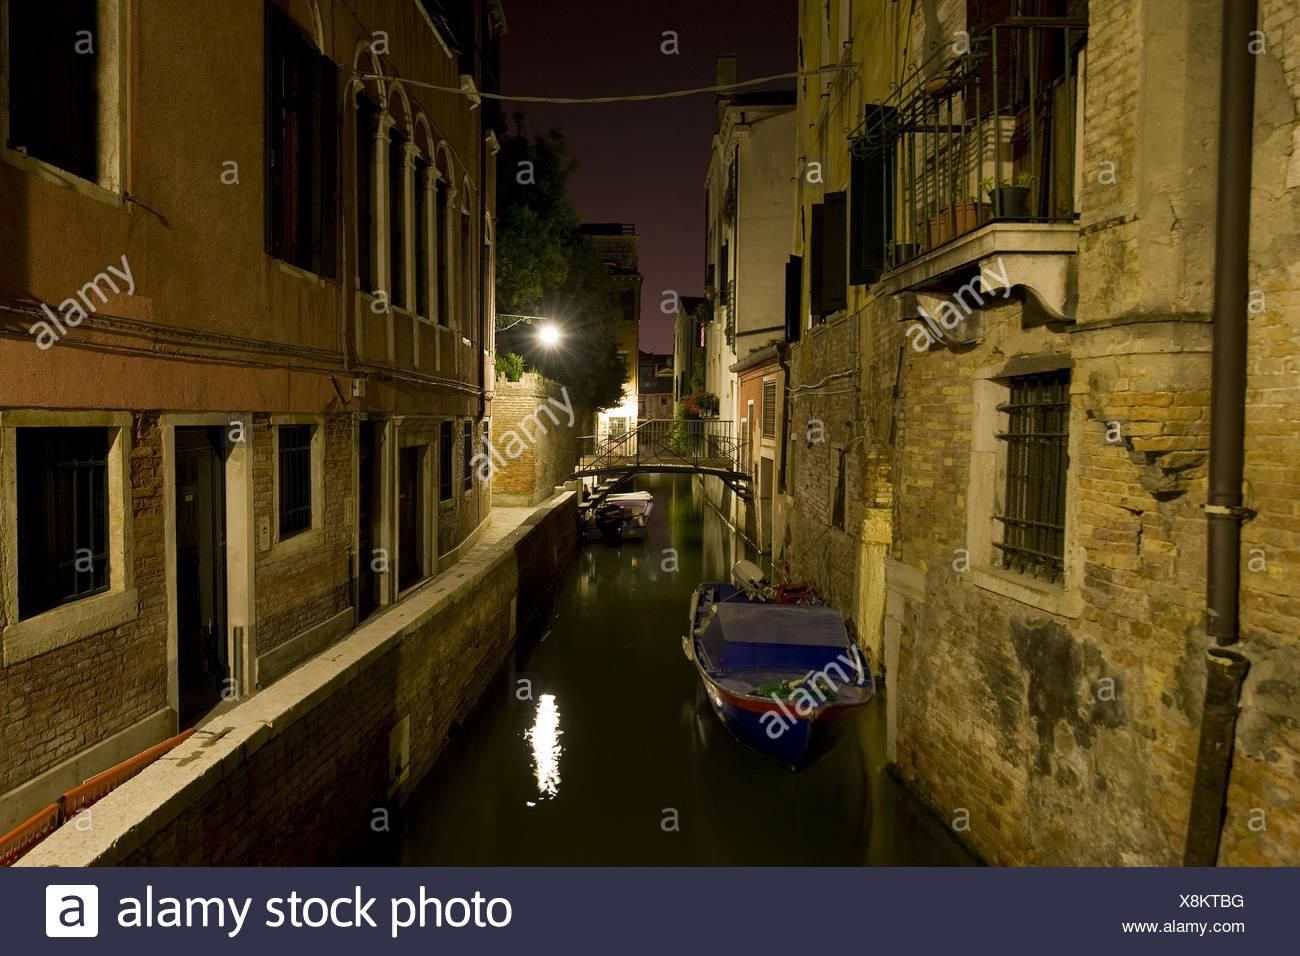 Kanal in Venedig bei Nacht - Stock Image